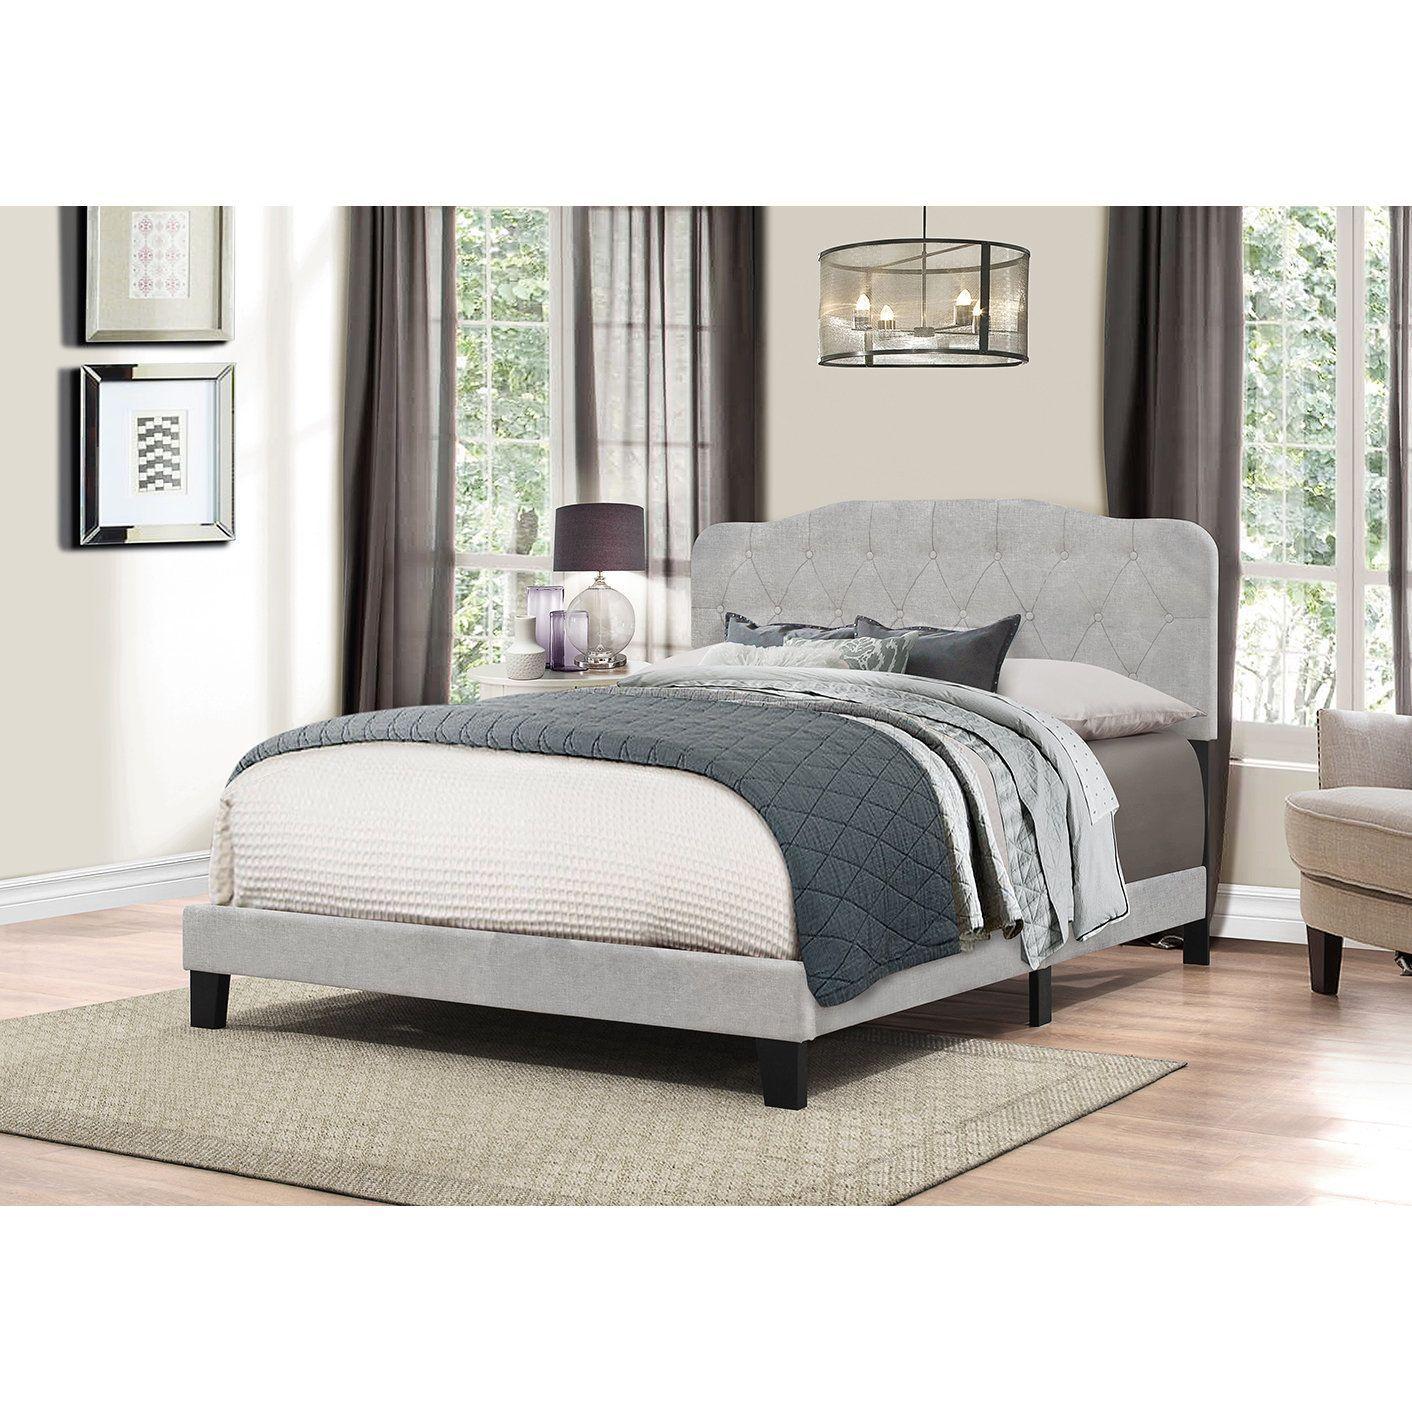 Hillsdale furniture nicole glacier grey fabric king bed headboard in